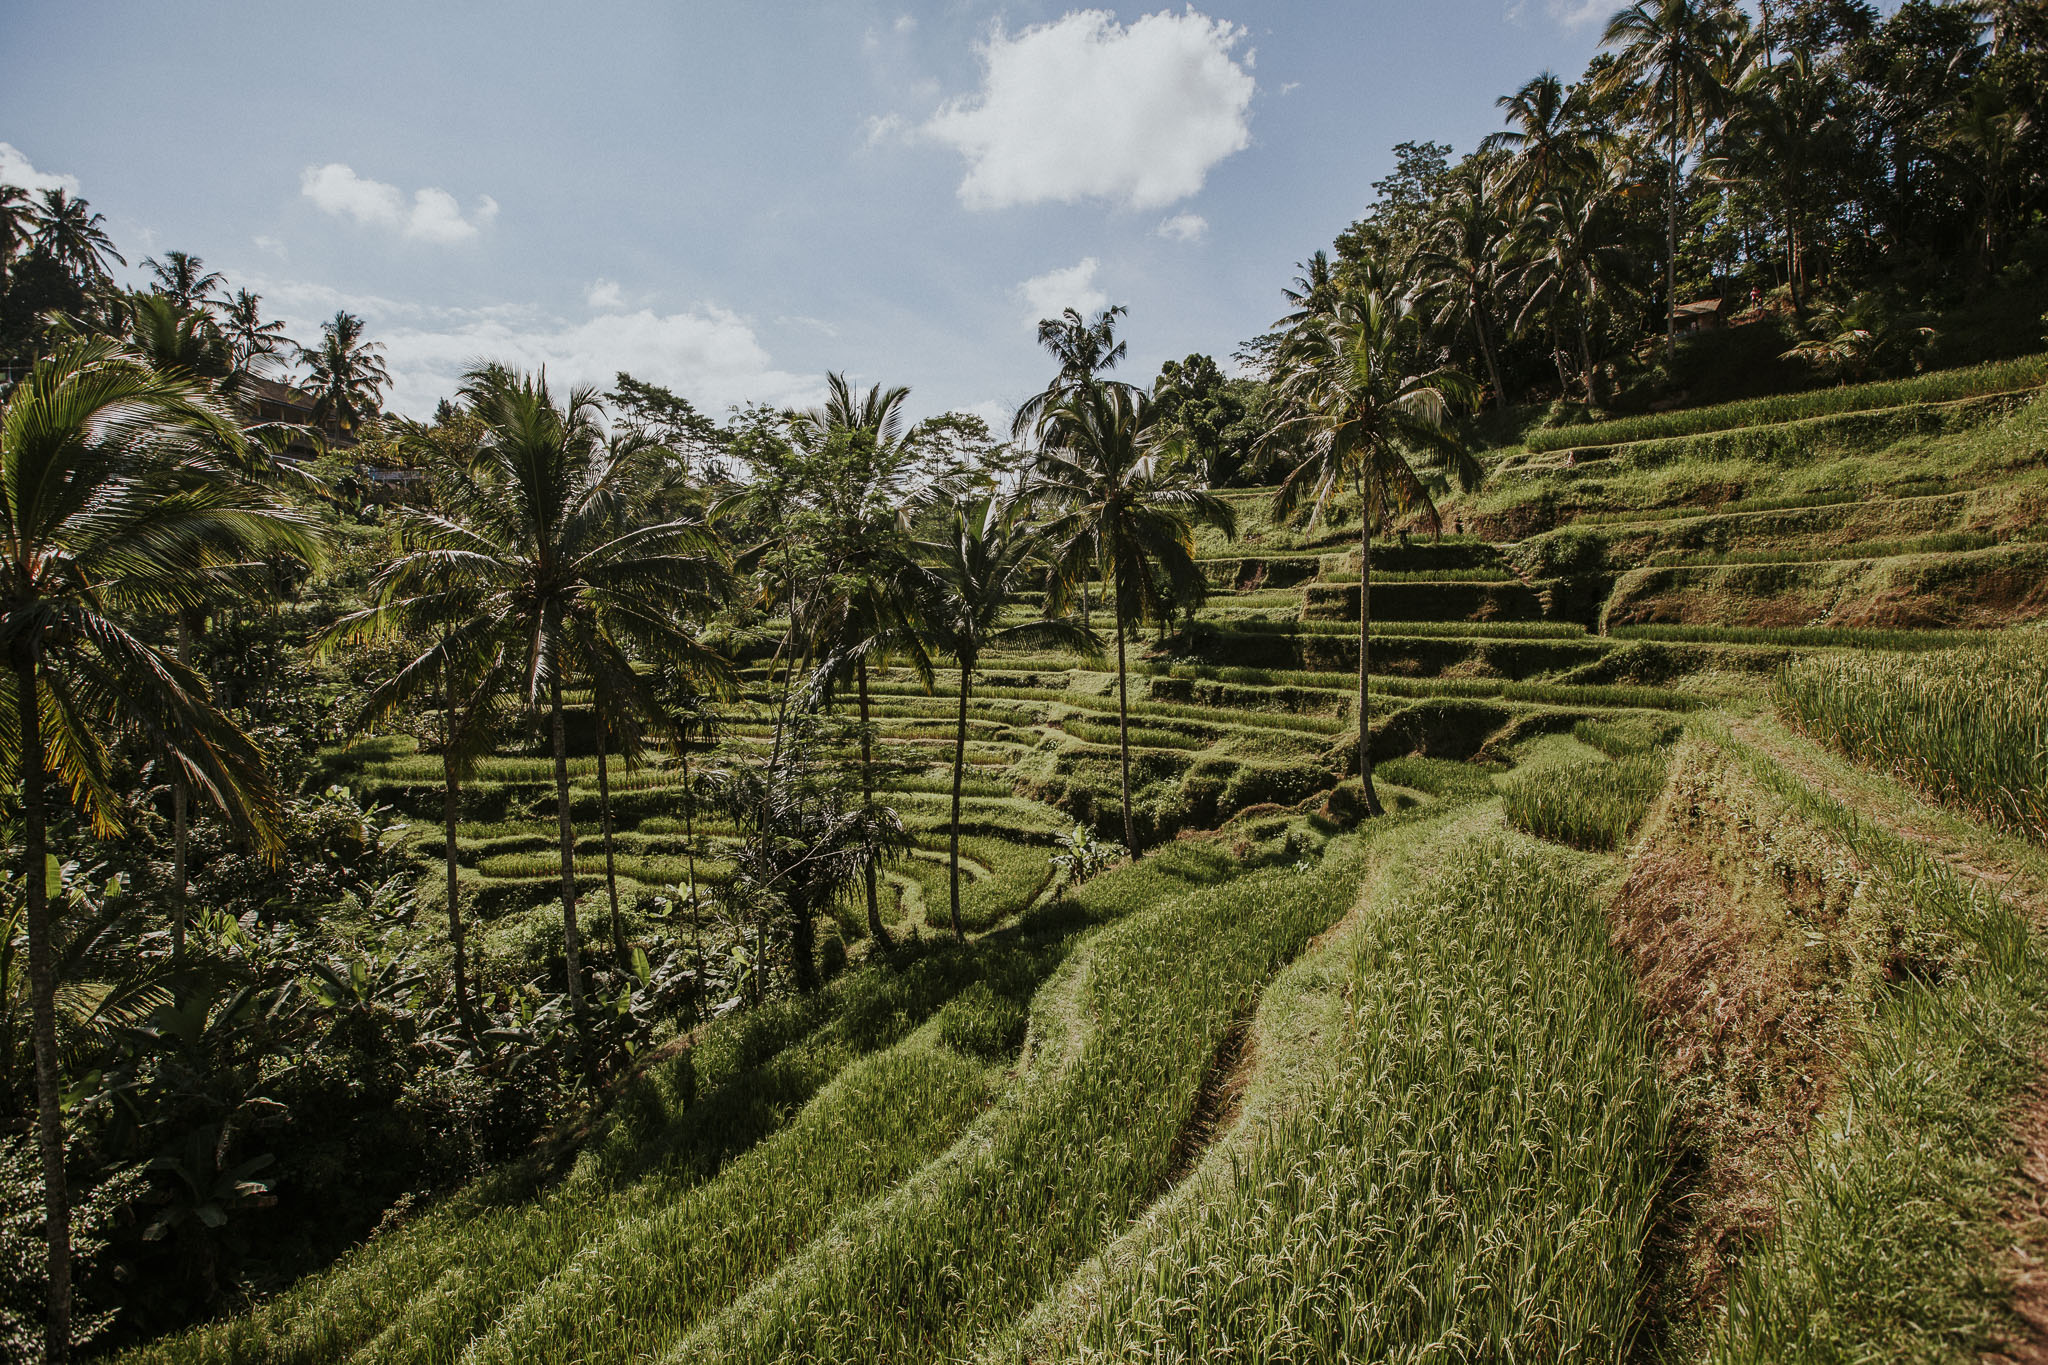 Bali Rice Paddy & Palm trees in Ubud